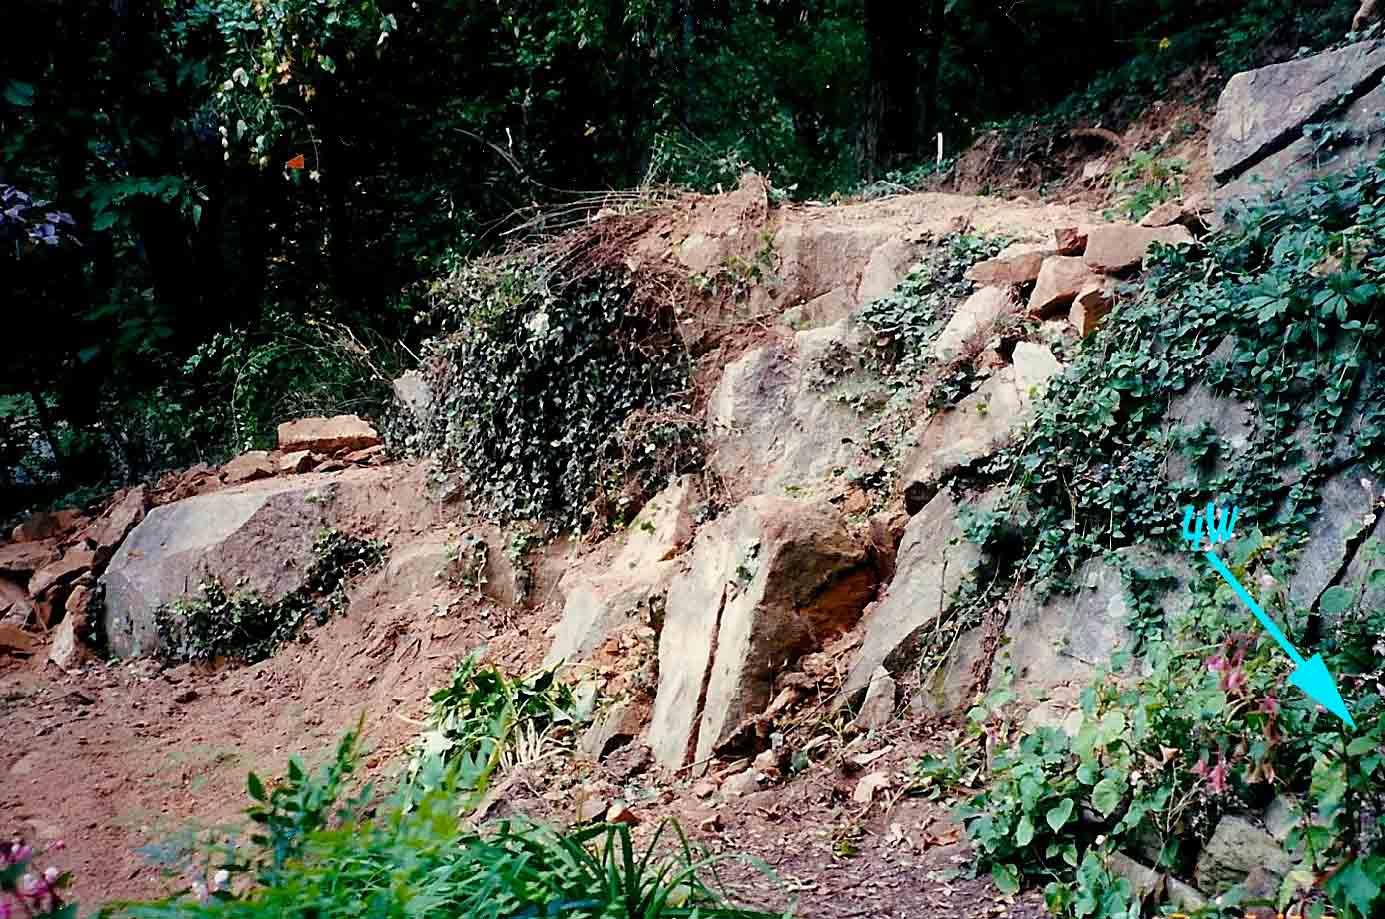 Quarry Shade Garden At Bon Air Park: Happy 25th Anniversary Quarry/Shade Garden!